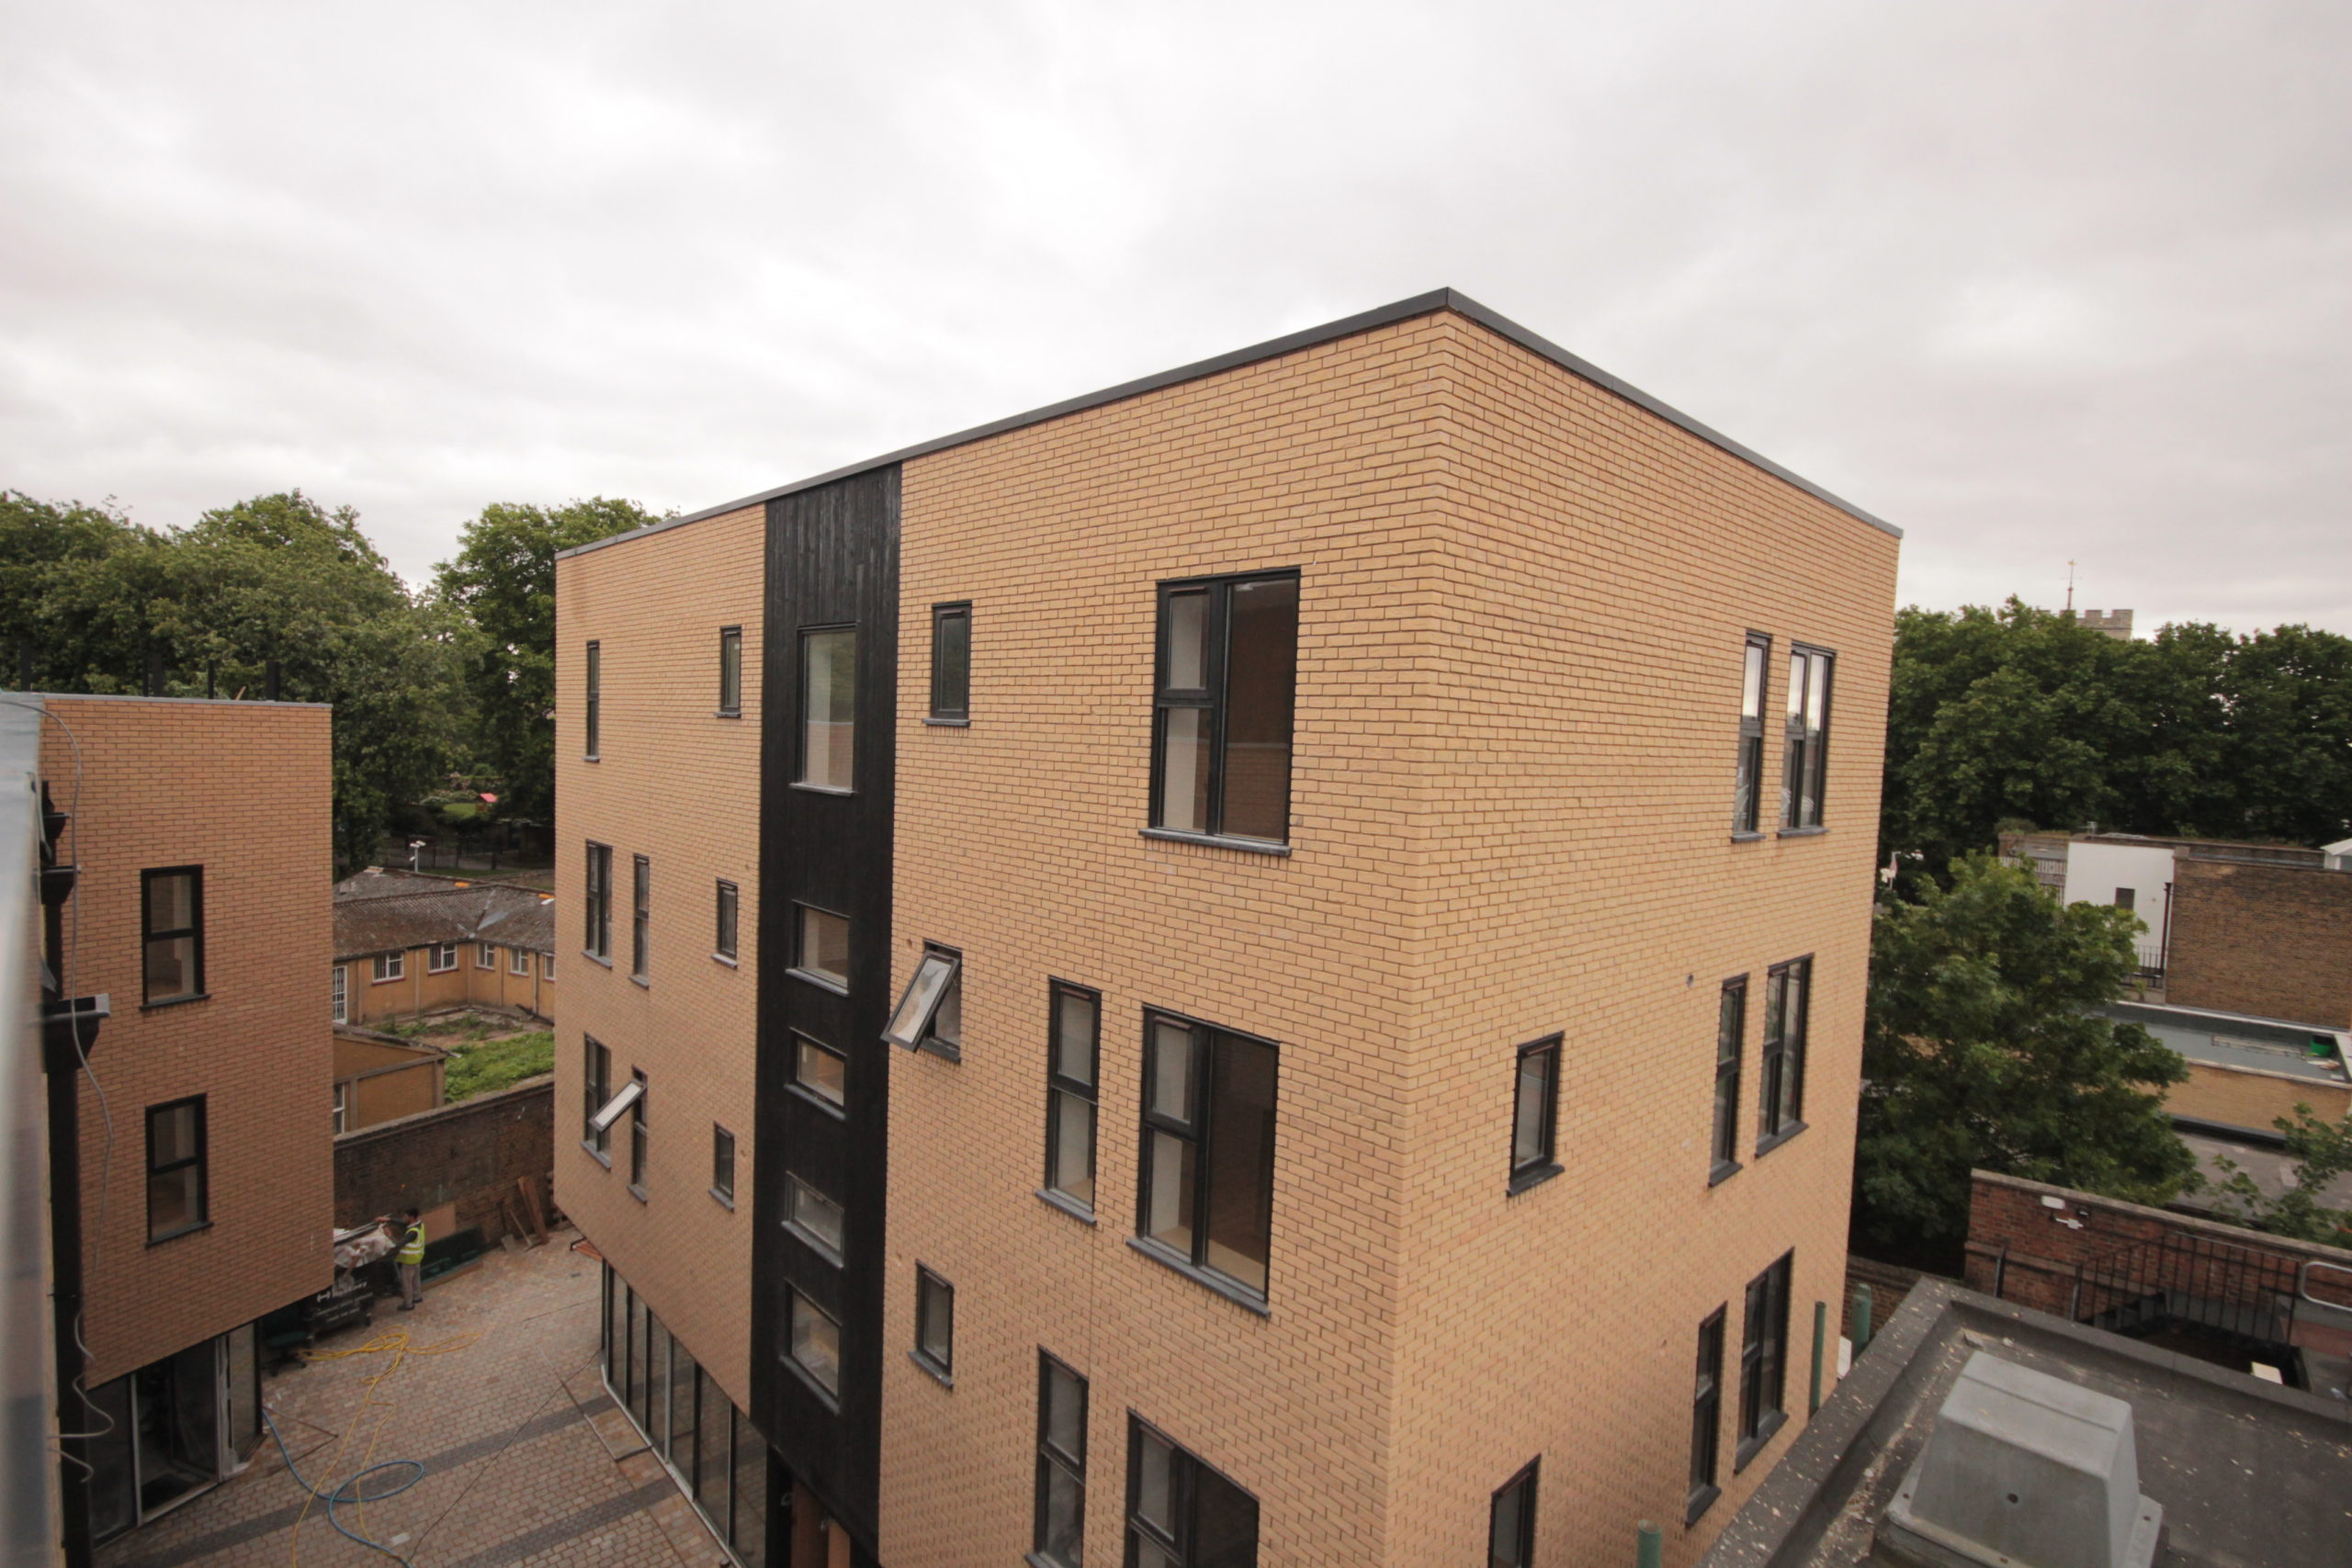 4 Bedroom, Dispensary Lane, Hackney, E8